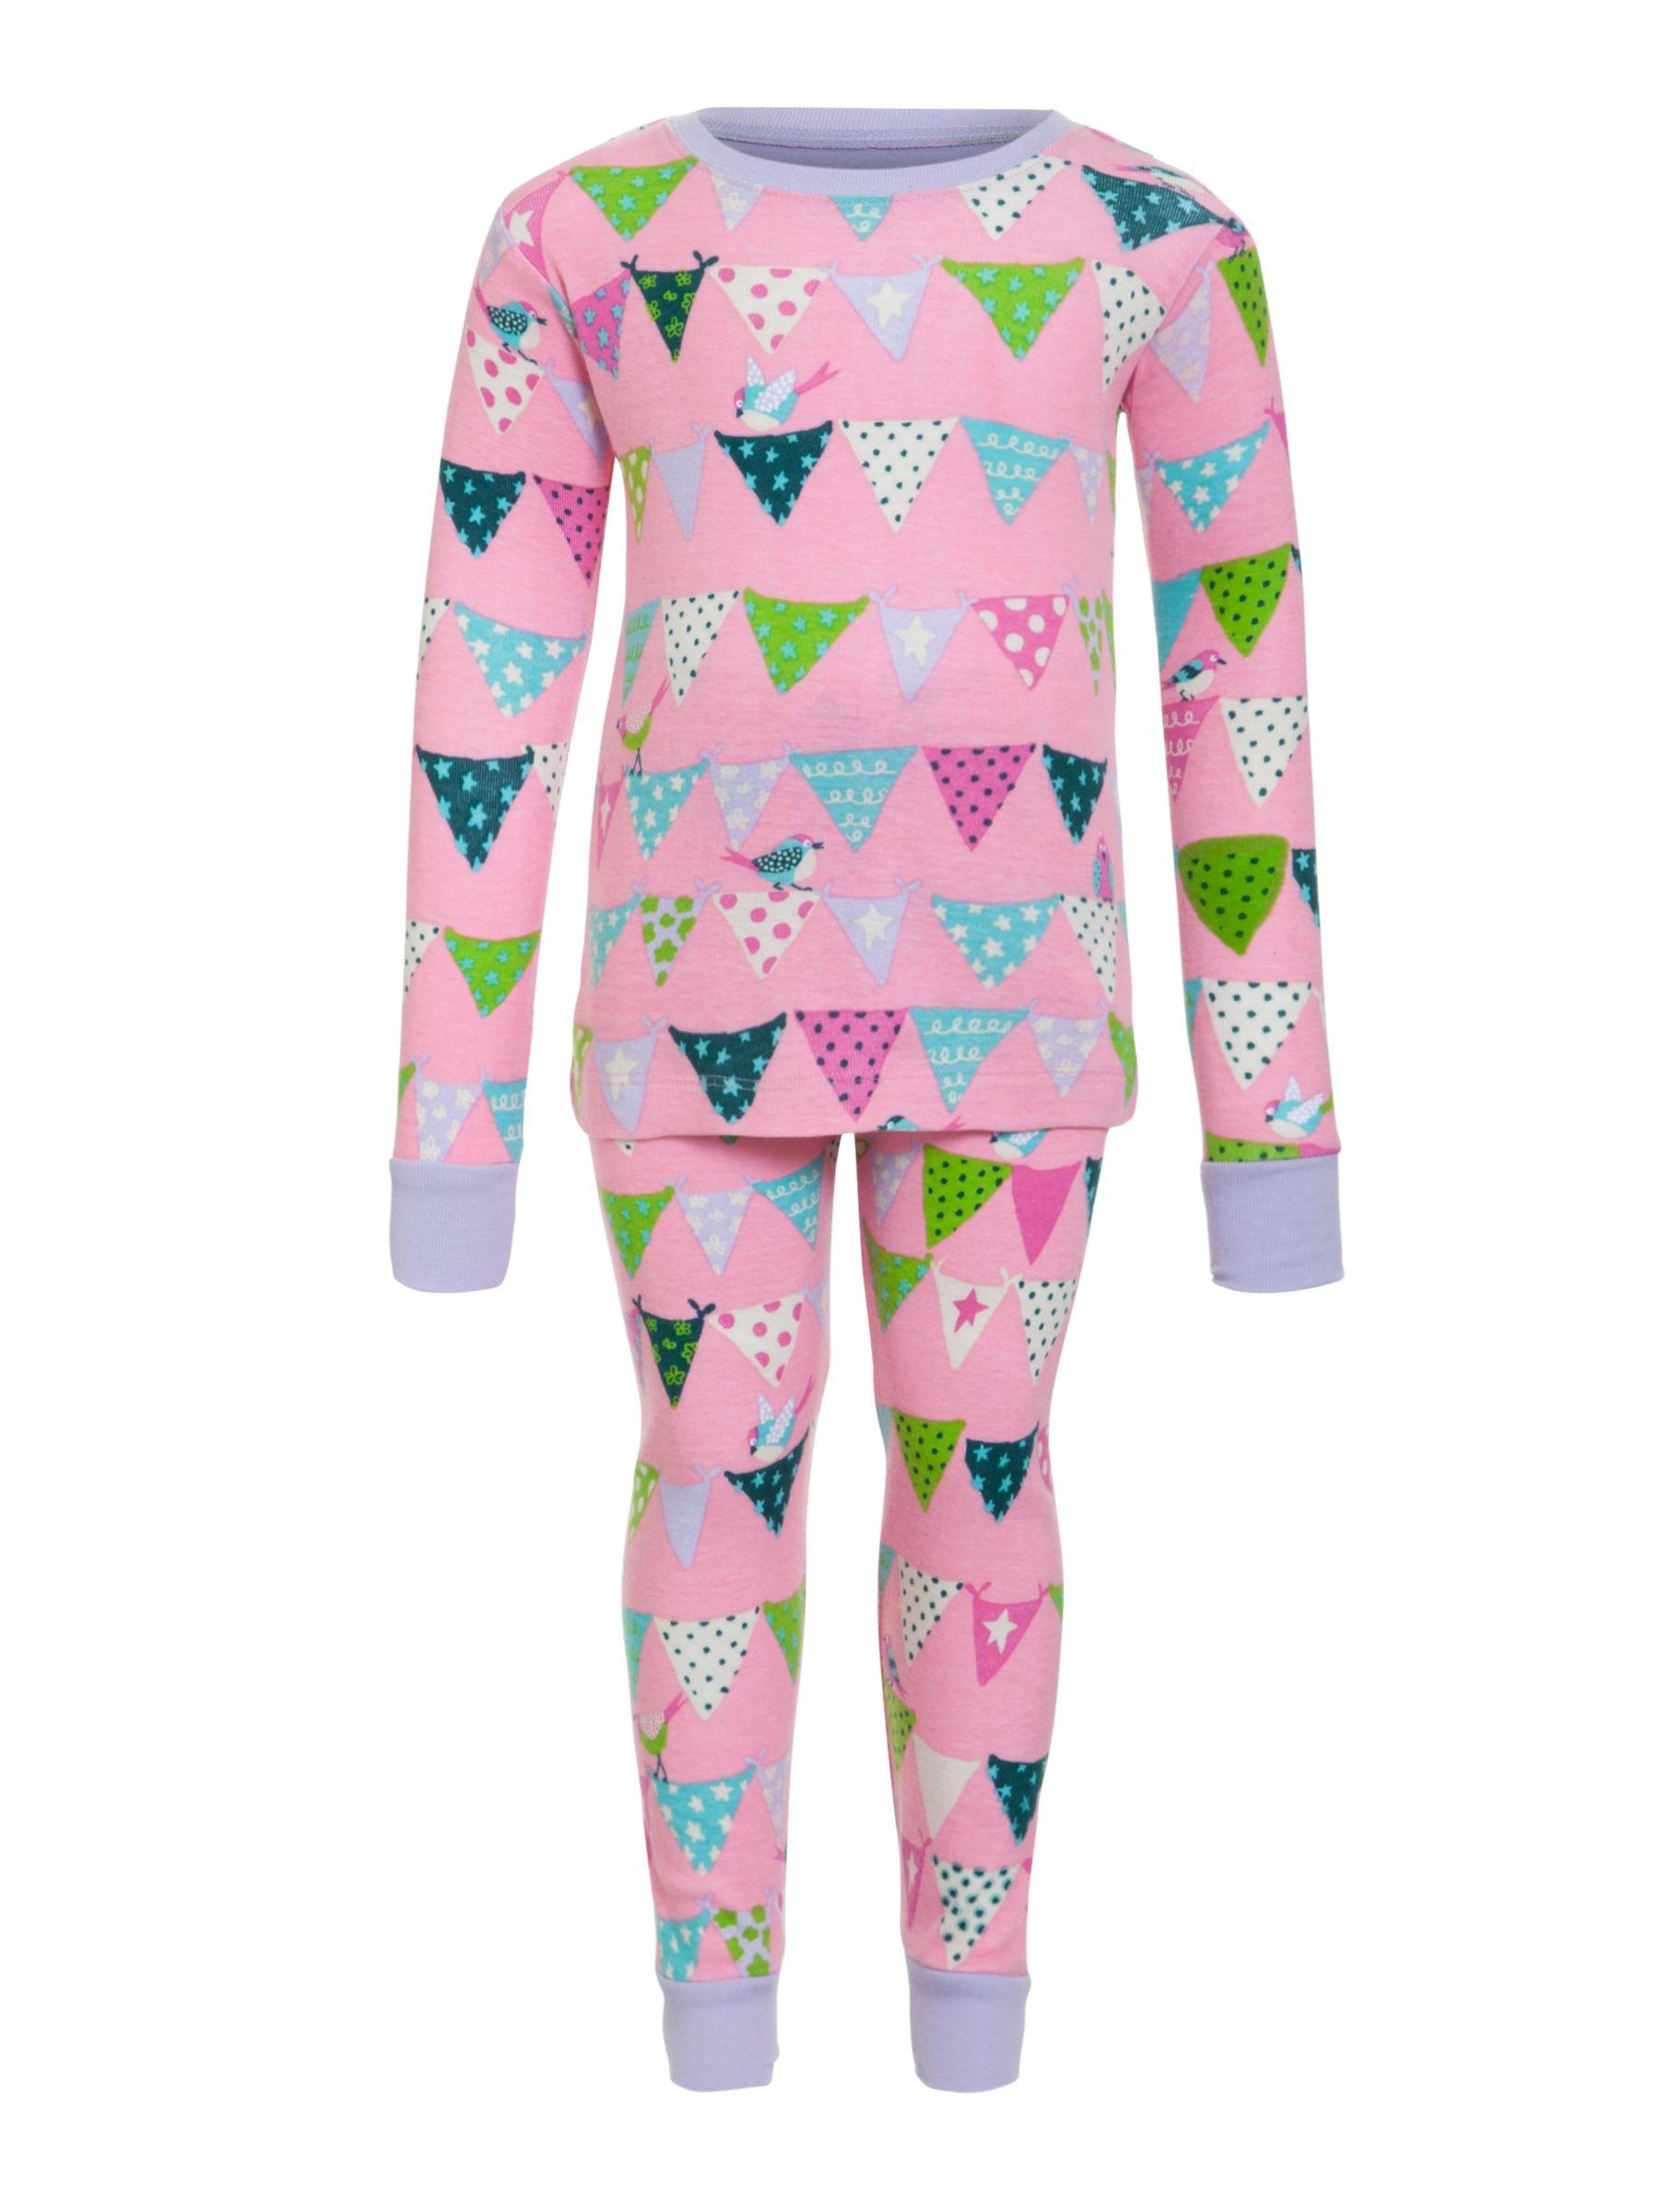 Hatley Girls' Bunting Bird Pyjamas, Pink